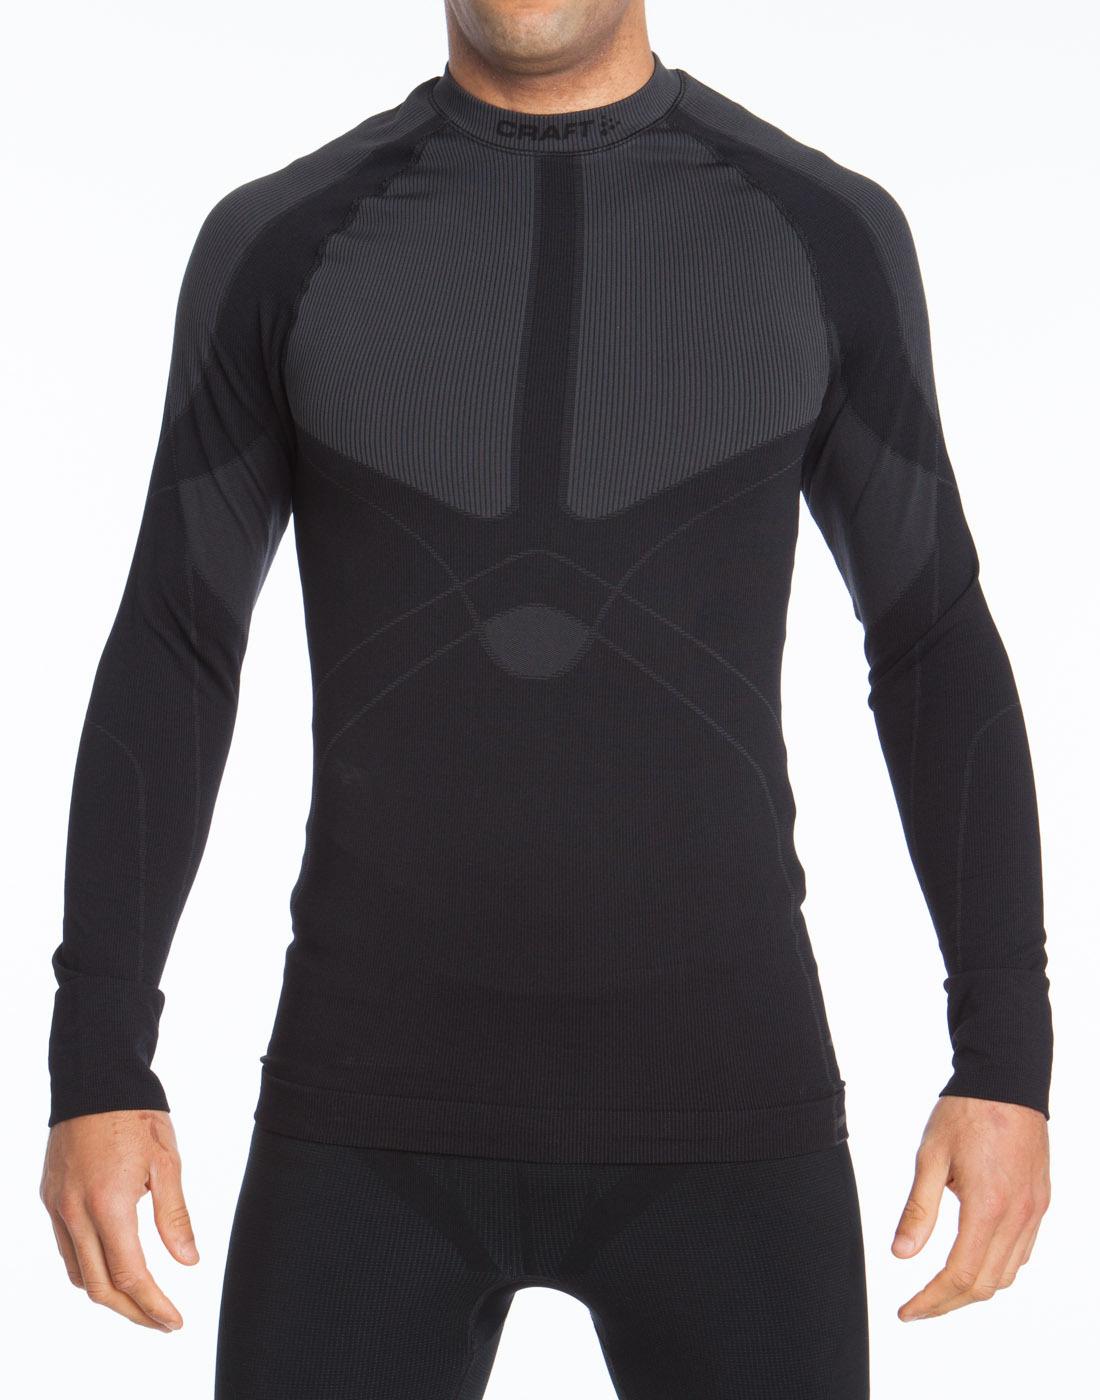 CRAFT WARM мужское термобелье рубашка - 5